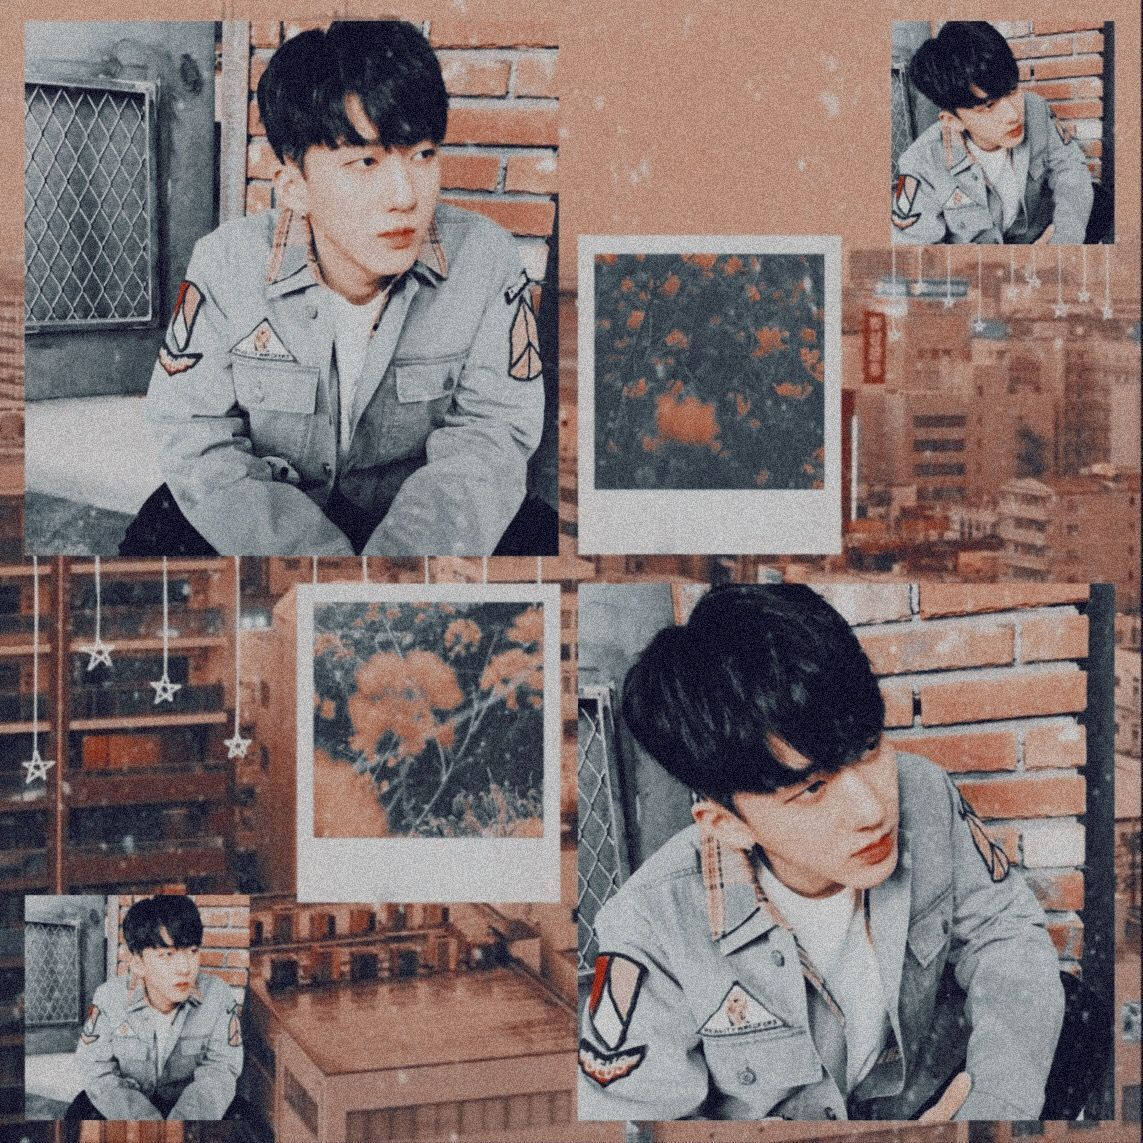 Changbin edit Changbin edit